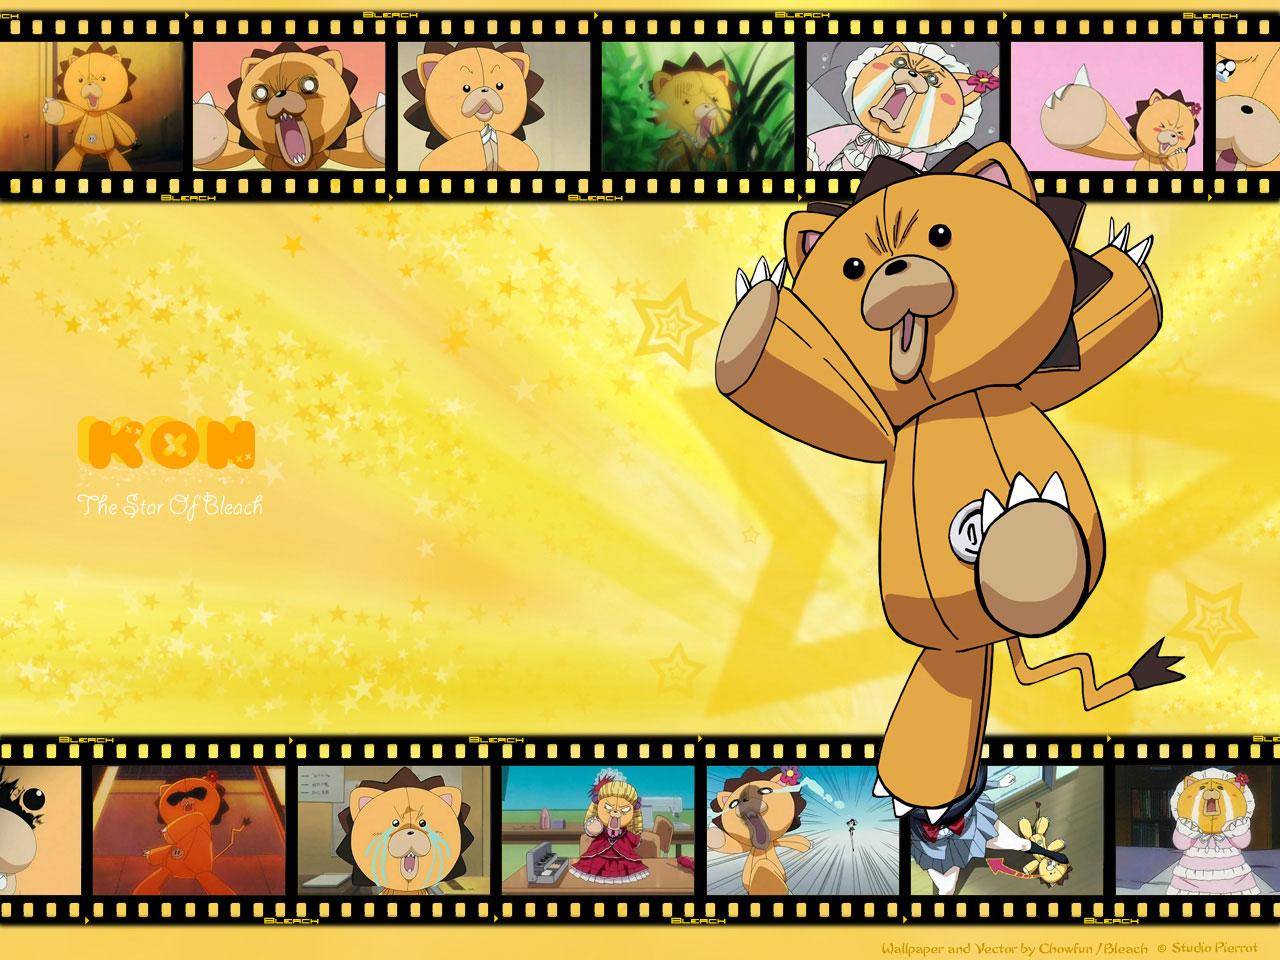 Bleach Anime Wallpapers Kaizo Konpaku Wallpapers Kaizo Konpaku 1280x960